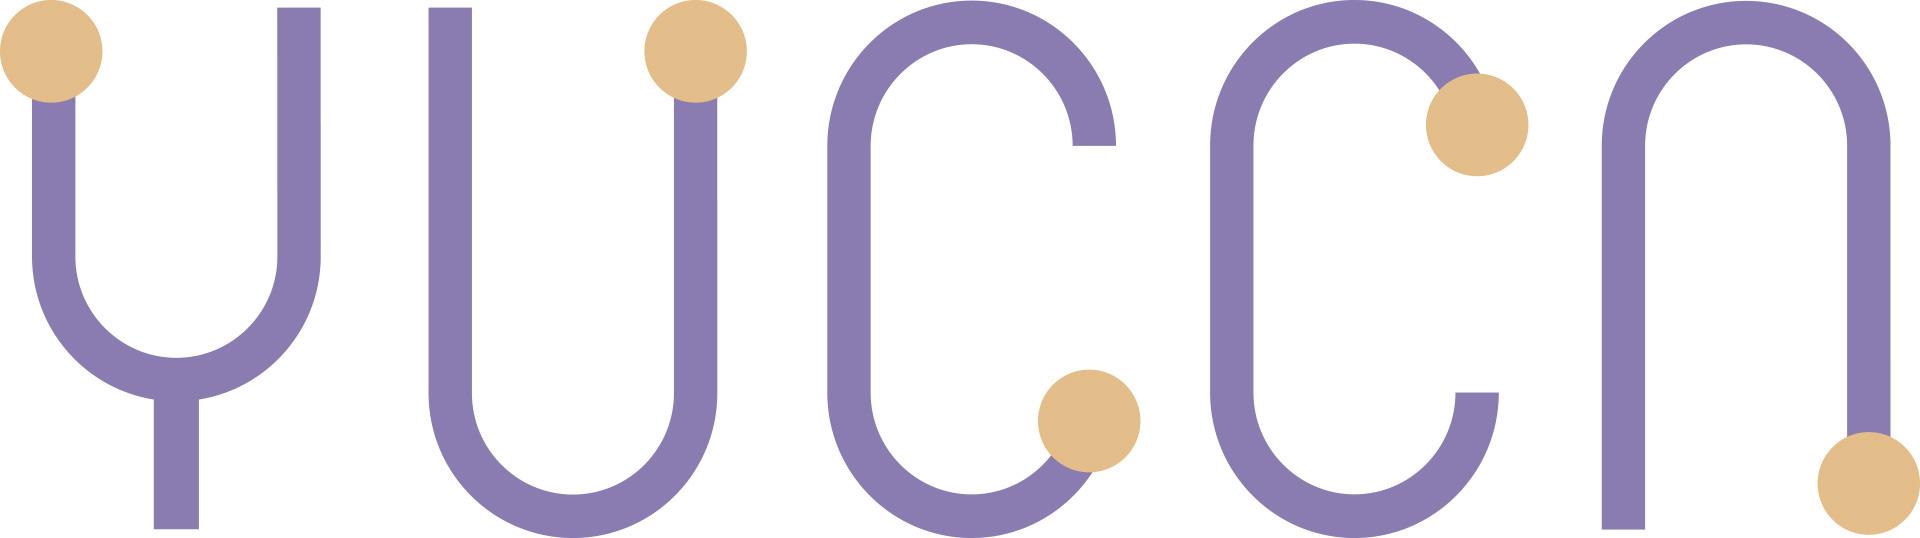 Alice_Stivala_Visual_Designer_Yucca_logotipo